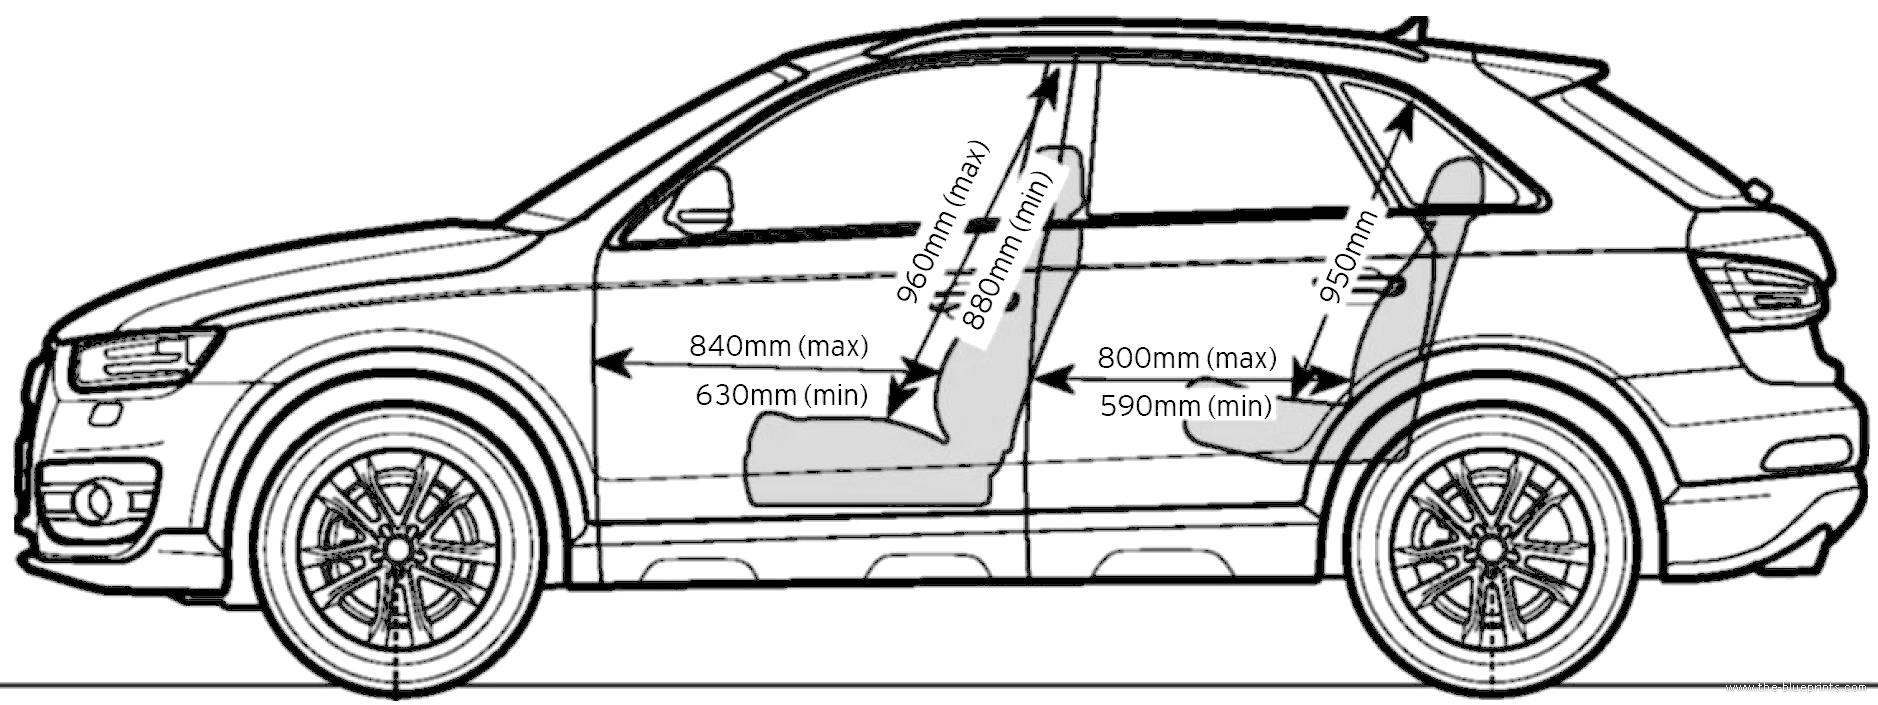 Blueprints > Cars > Audi > Audi Q3 2.0 TDI Sport (2013)